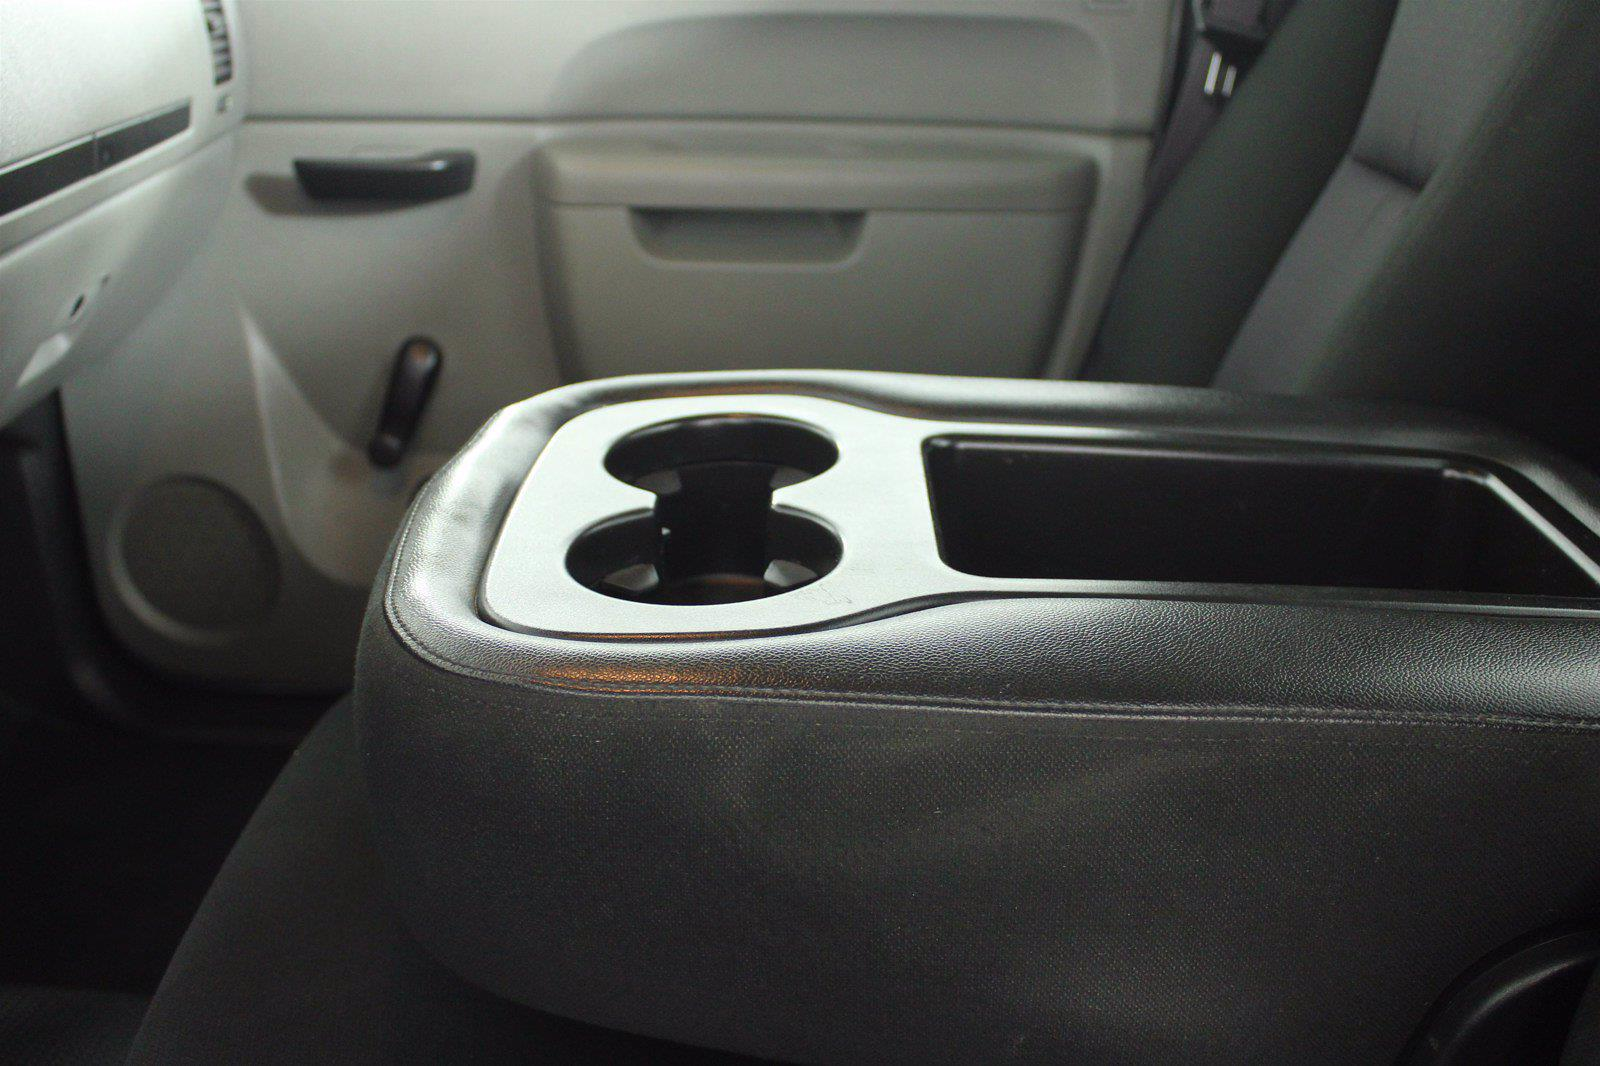 2012 Silverado 1500 Regular Cab 4x4,  Pickup #D120034A - photo 18